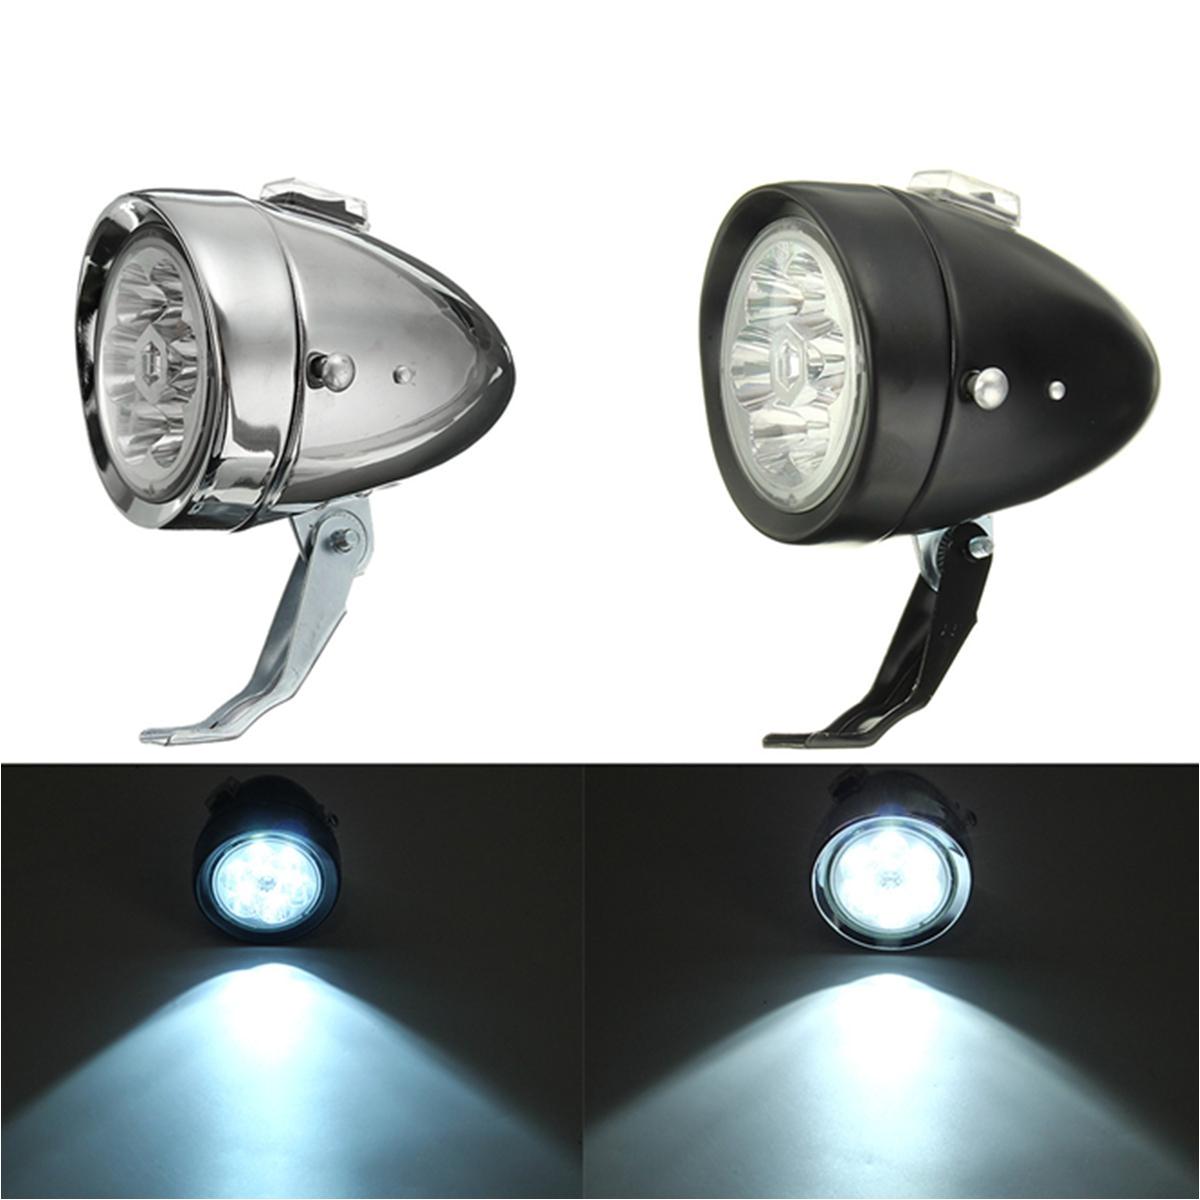 retro vintage e bike bike front light led headlight head fog lamp with bracket